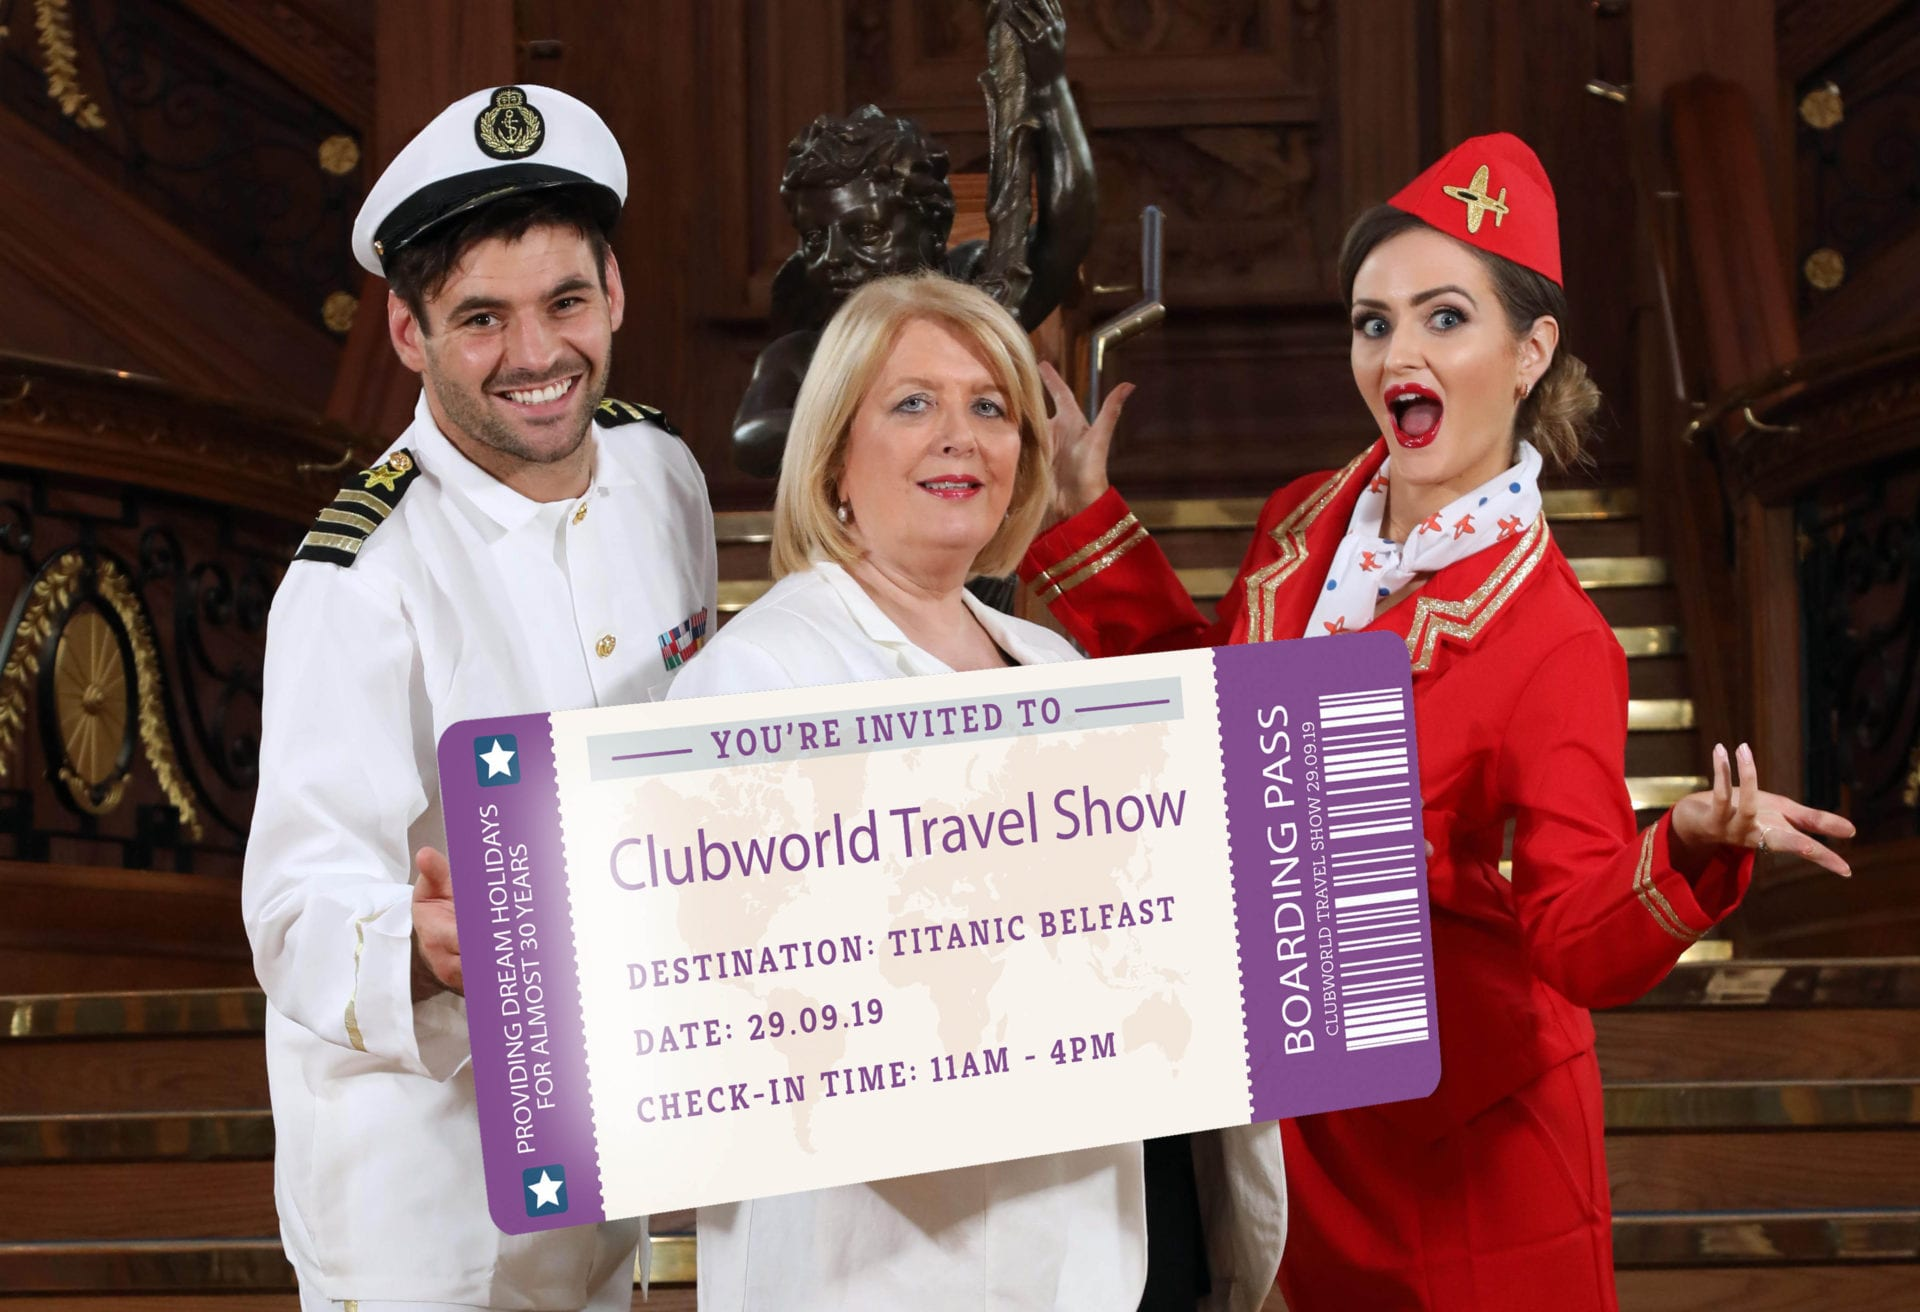 Clubworld Travel Showcase